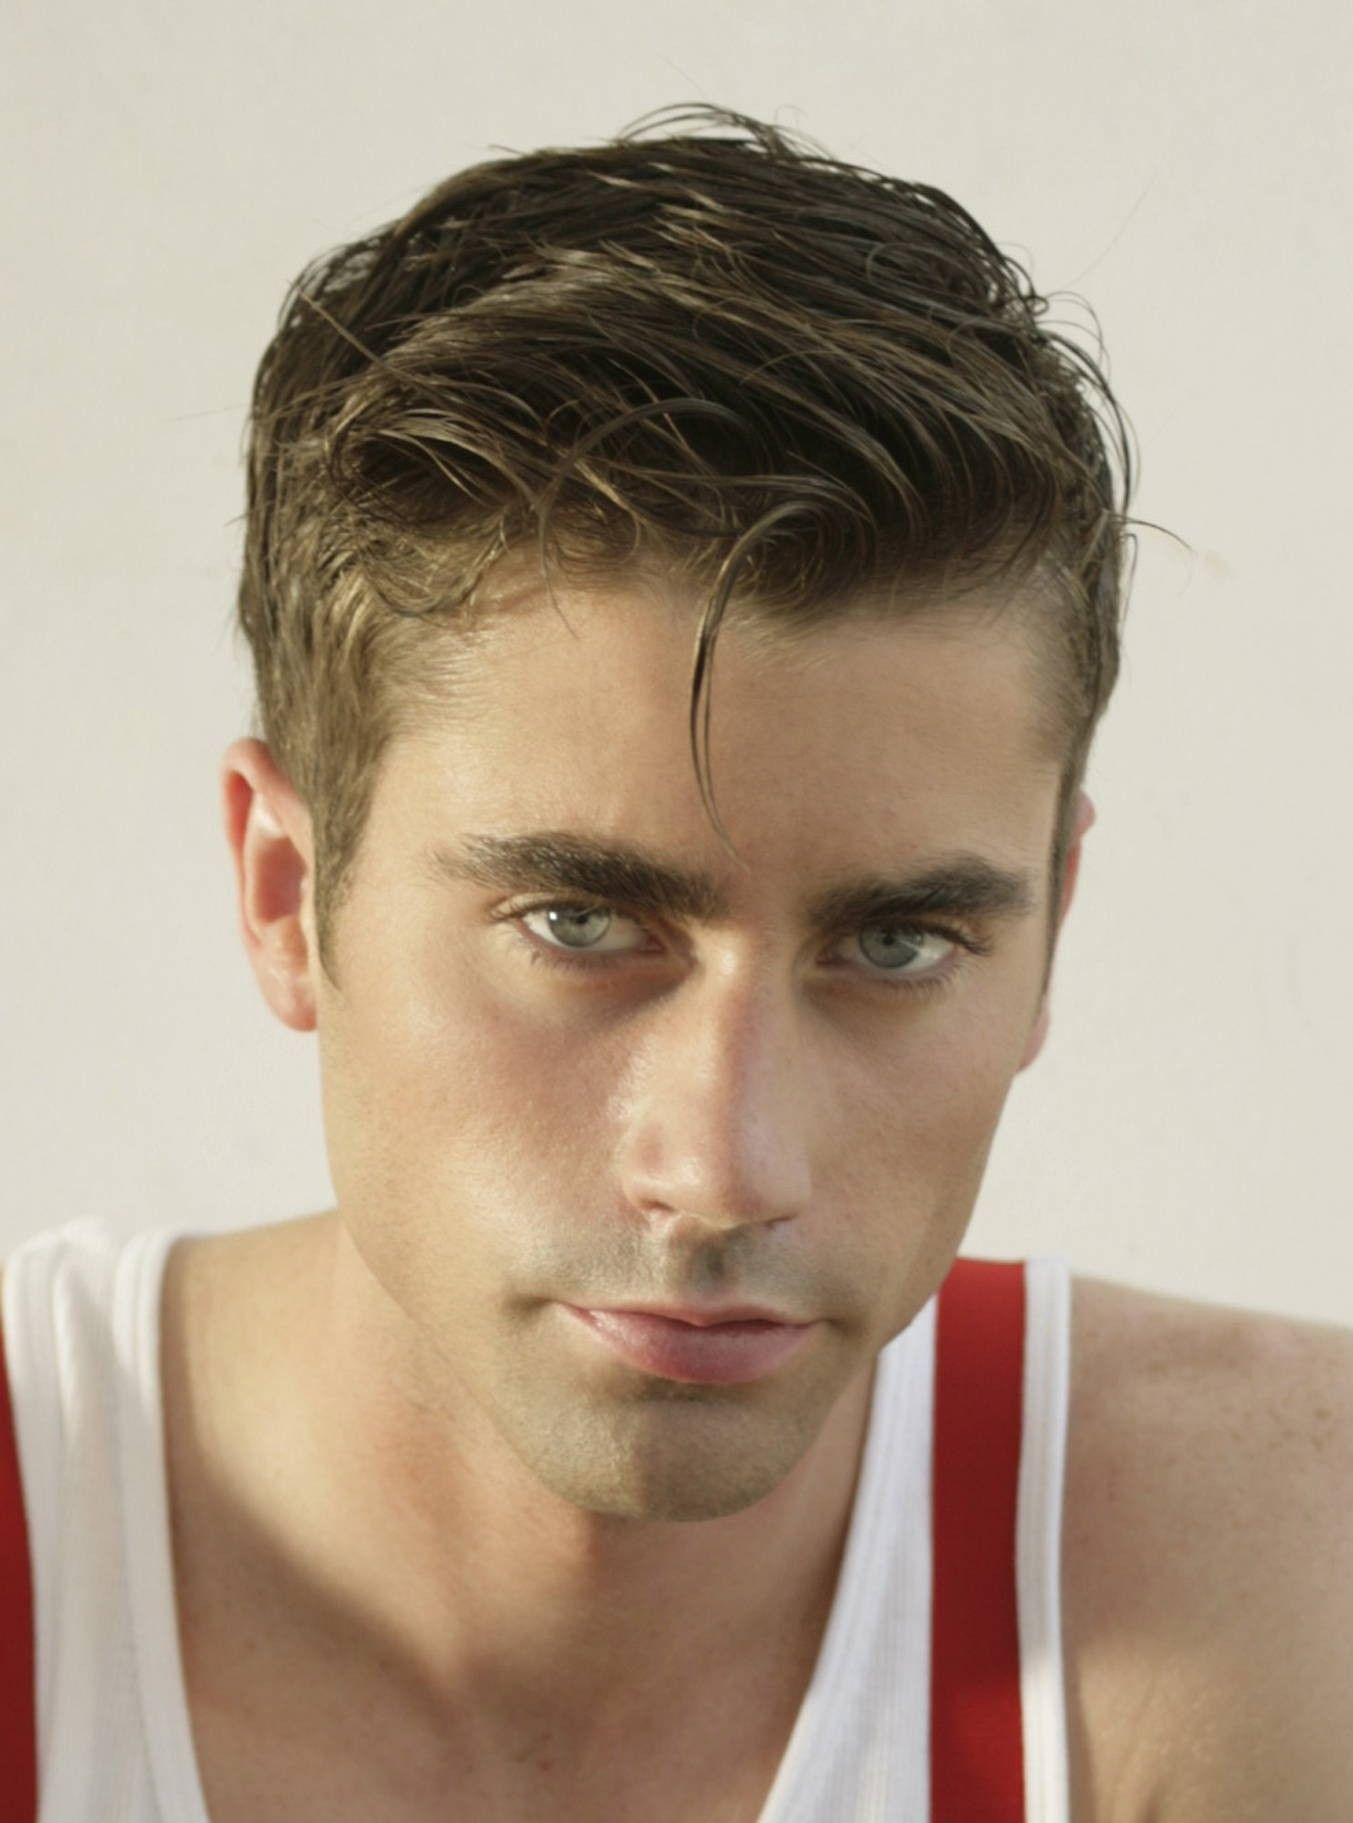 The Most Beneficial Mens Short Hairstyles 2013 For Thick Hair Thin Hair Men Mens Haircuts Short Long Hair Styles Men